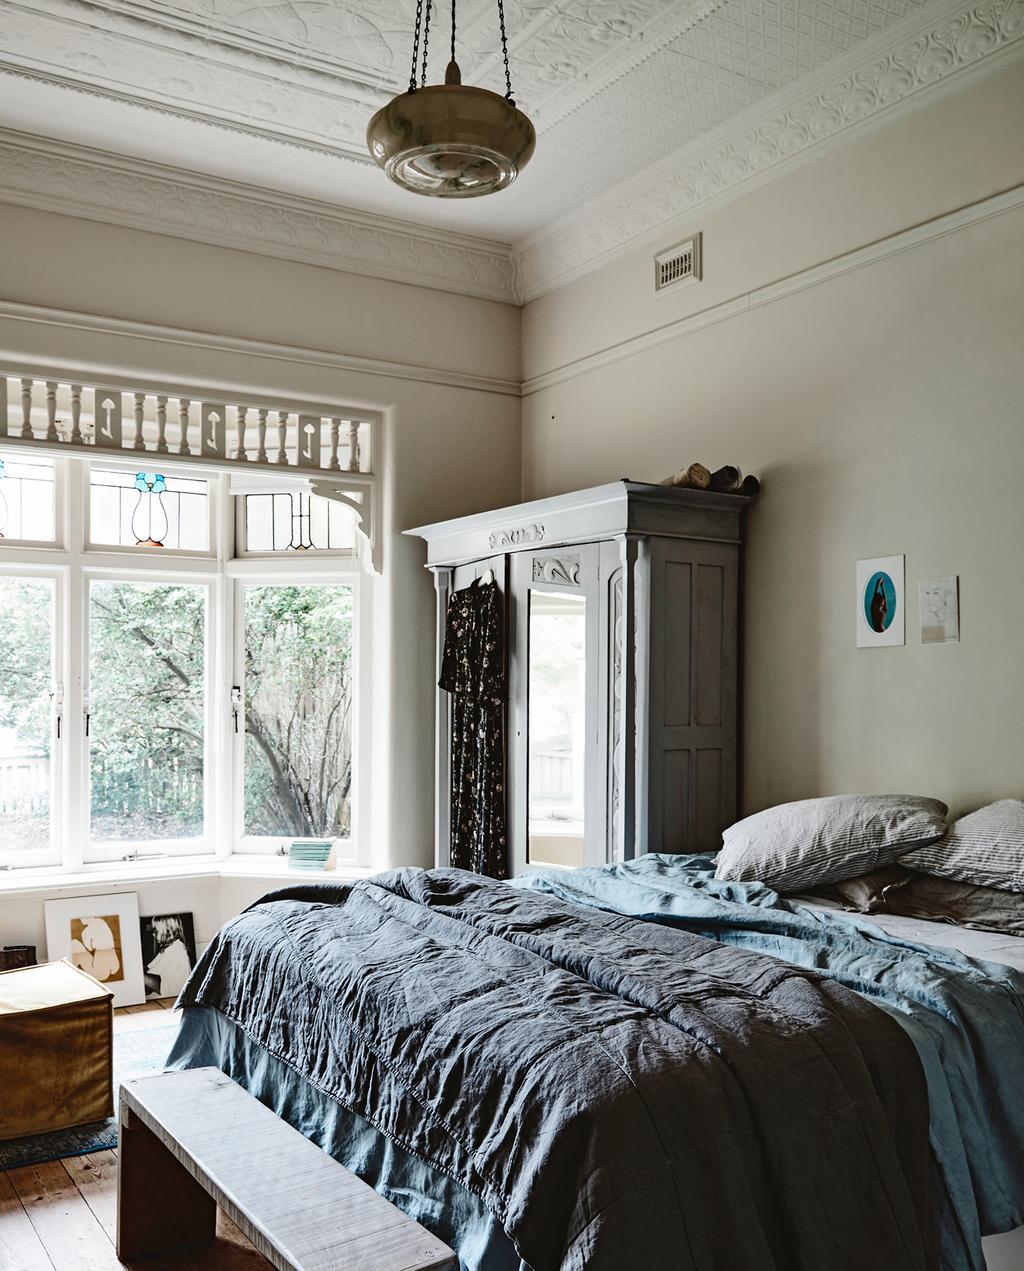 vtwonen 2-2020 | romantische slaapkamer